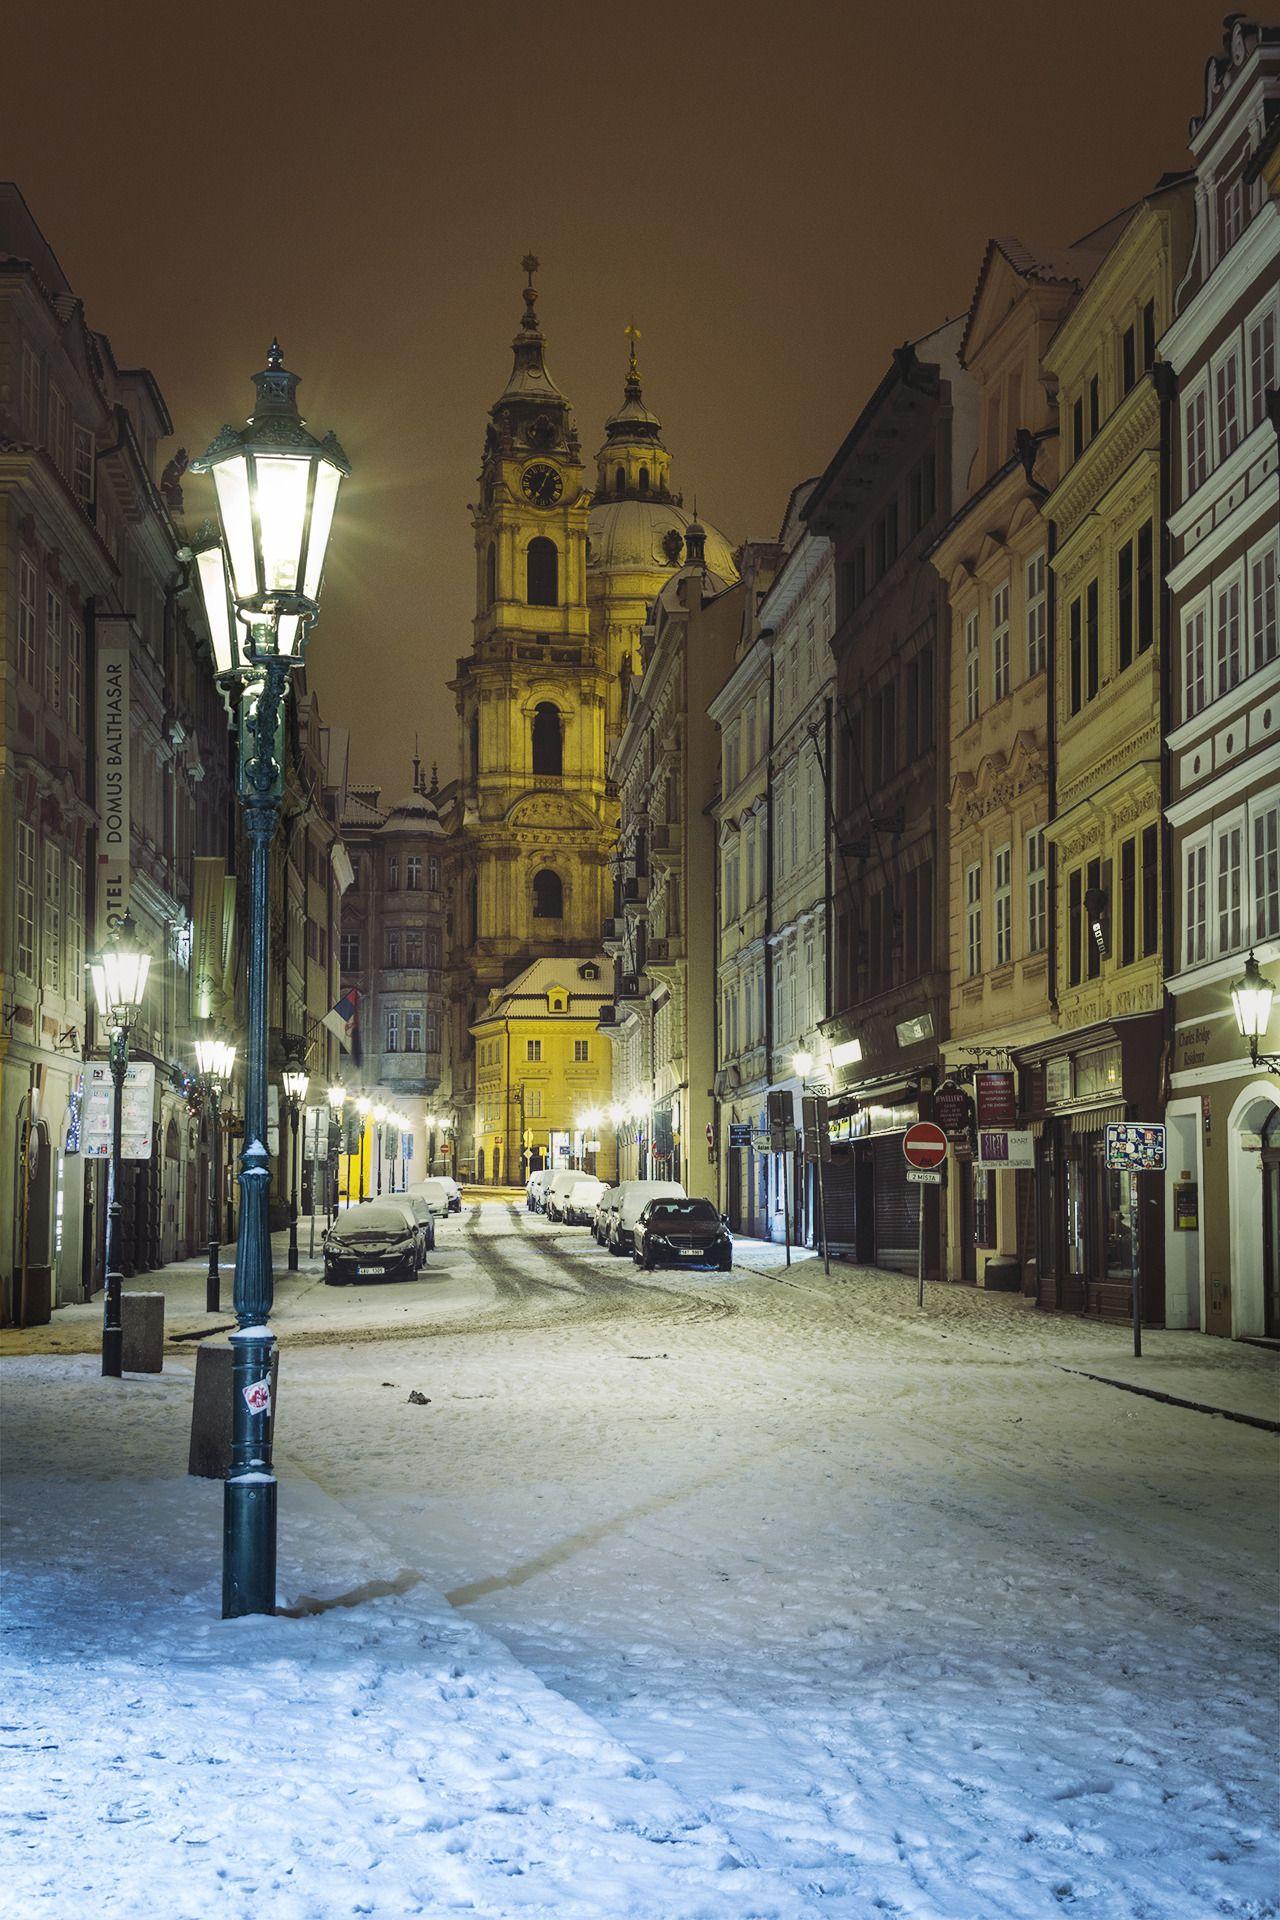 By czechthecount: instagram   facebook   500px   society6 - #2017 #city #current #czech #europe #january #my #on #original #photographers #photography #photos #prague #praha #republic #snow #Street #travel #Tumblr #vertical #winter